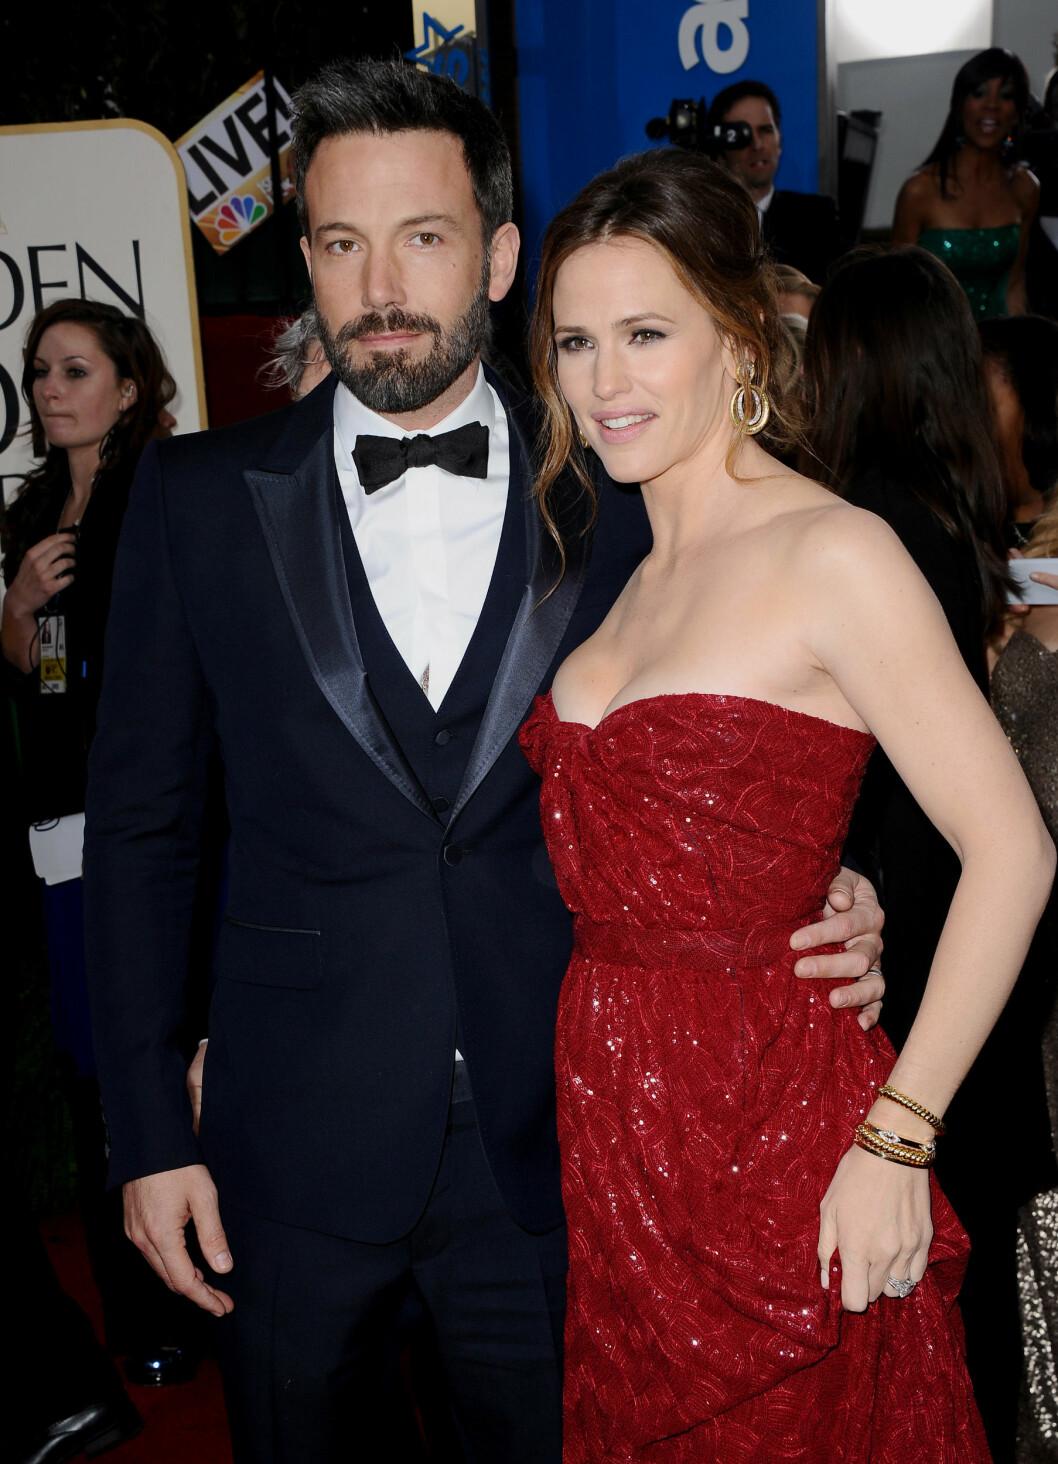 <strong>VINTEREN 2013:</strong> Ben Affleck og Jennifer Garner ankommer Golden Globe sammen i januar det året. Affleck vant pris for beste regi med «Argo». Foto: Abaca